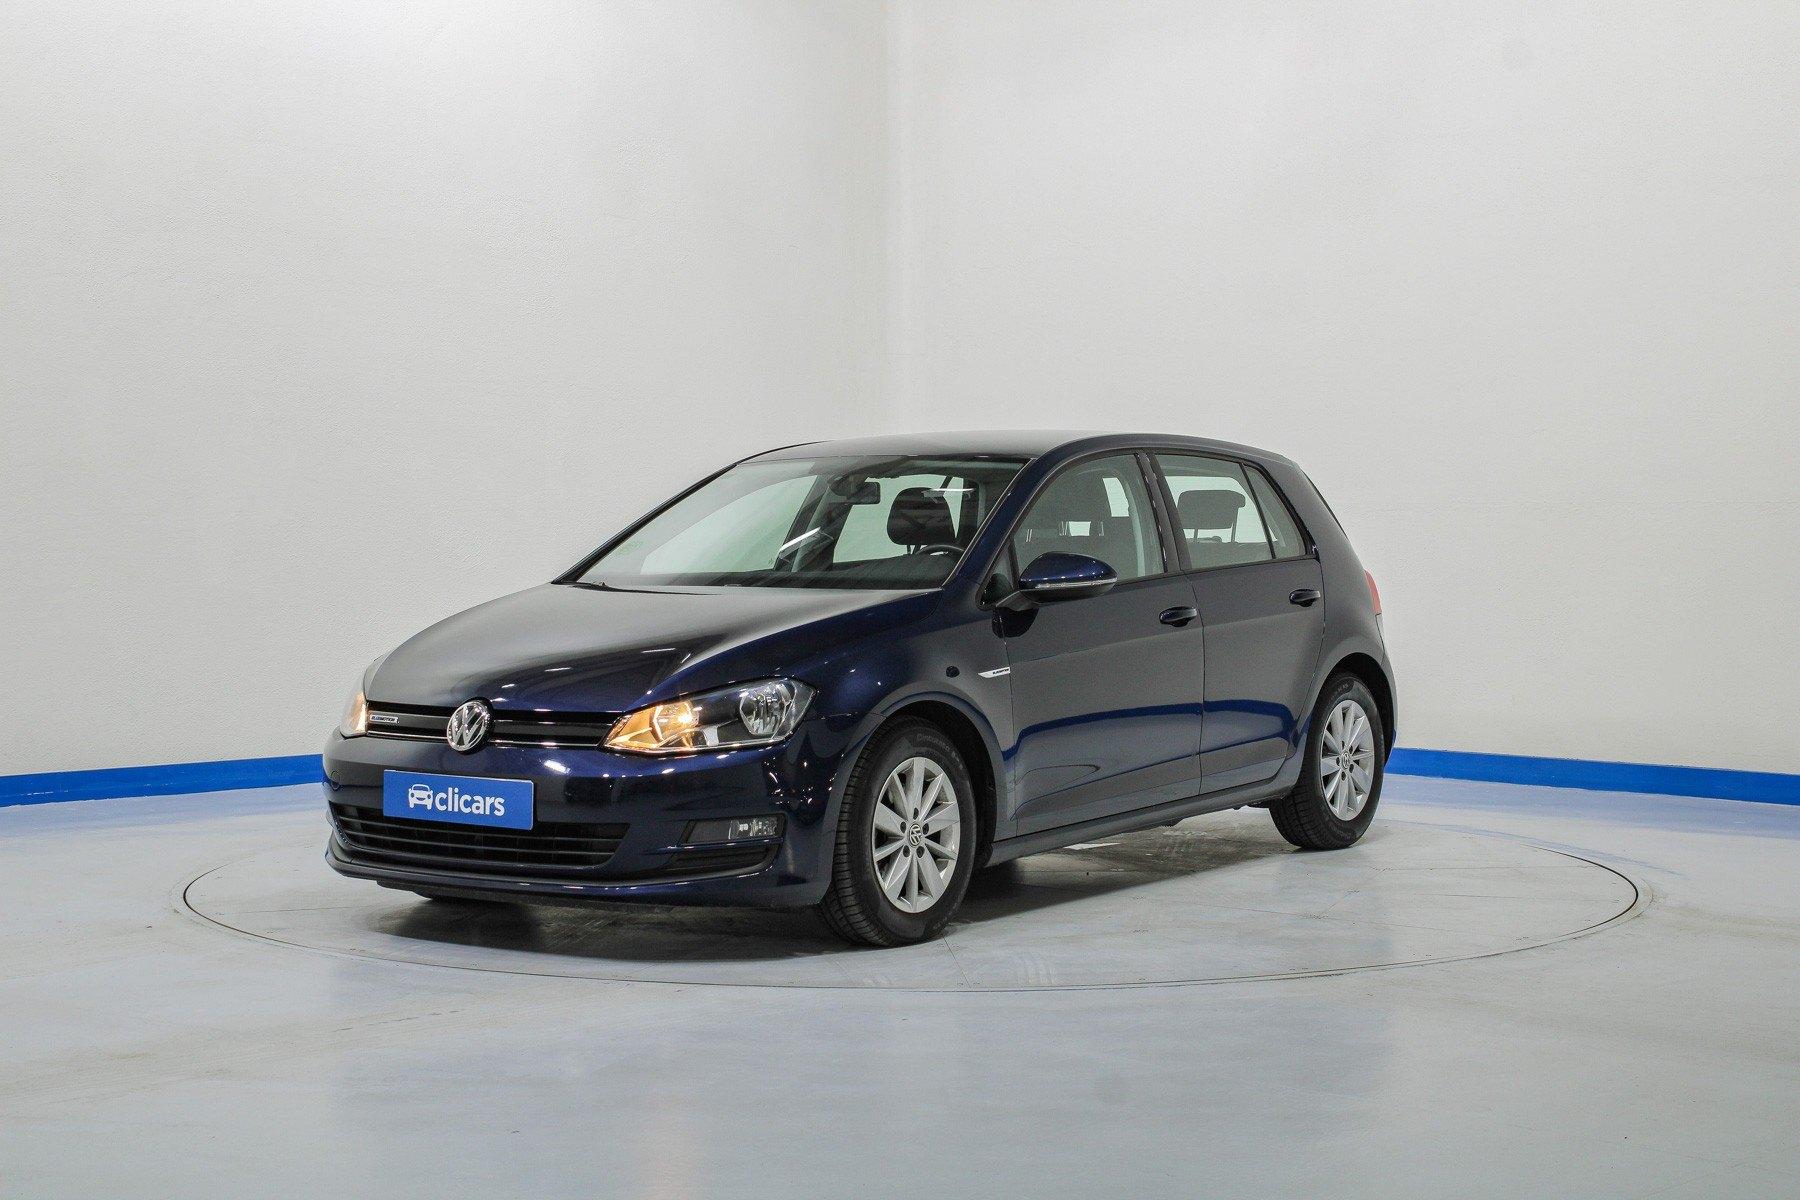 Volkswagen Golf Diésel Business & Navi 1.6 TDI 110CV BlueMotion 1